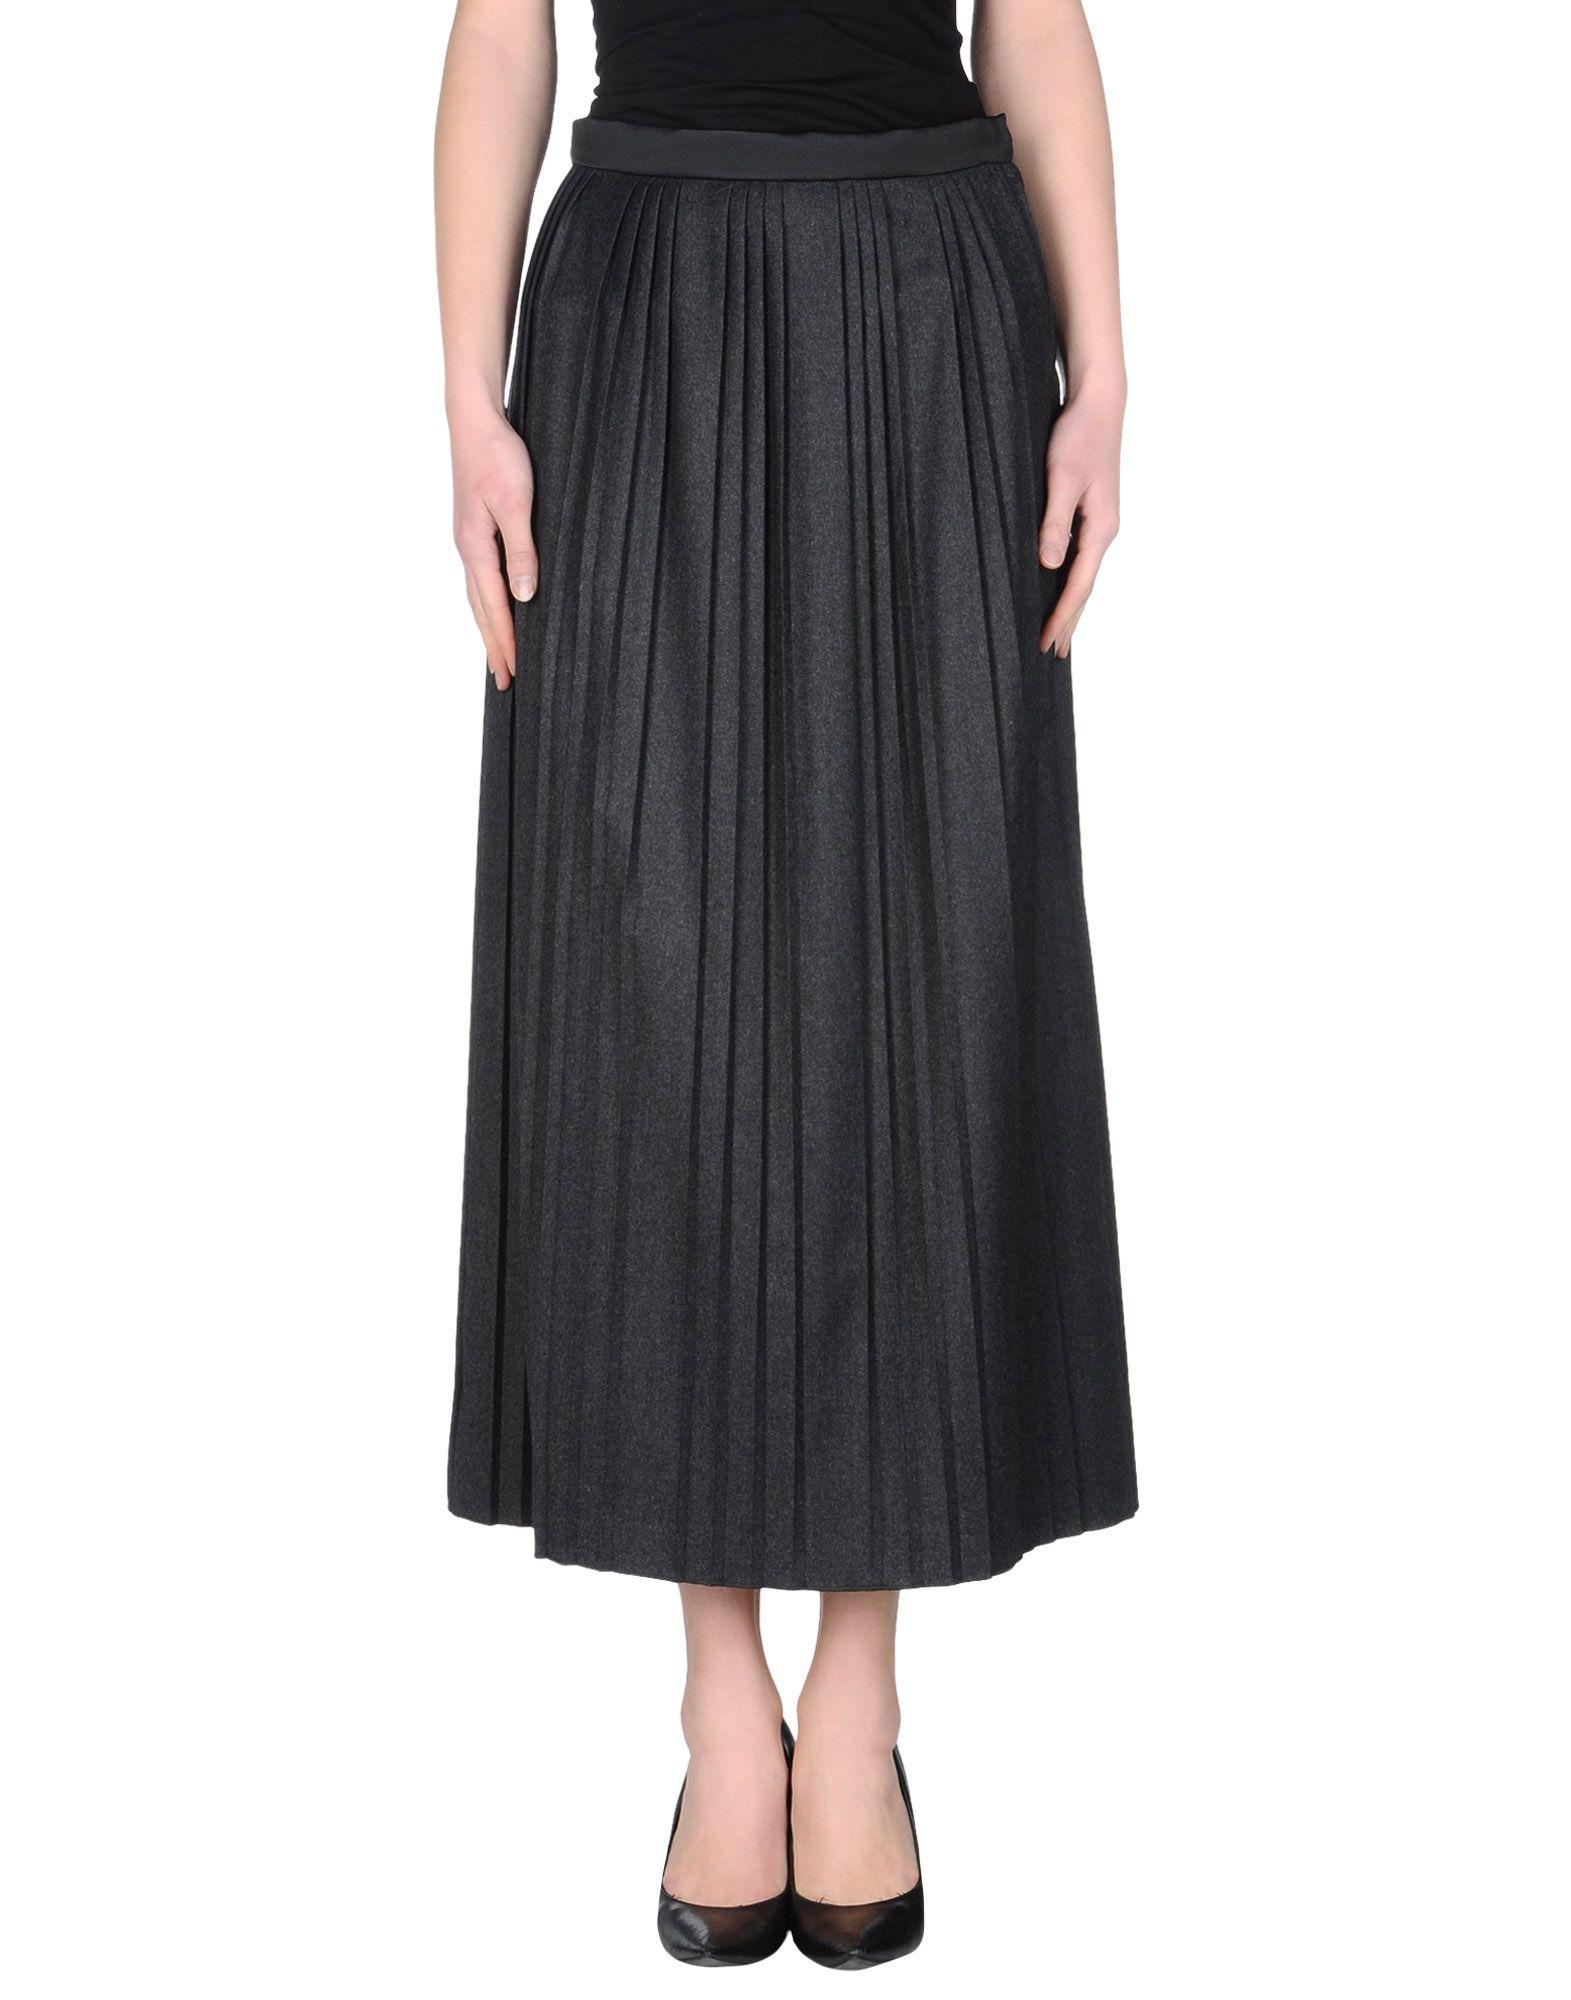 "Lularoe Size XS X Small Women's Heathered Gray Foldable Waist Long Maxi Skirt Length: 39"" (can fold waist if needed to shorten to desired length). Waist lying flat: 14""."